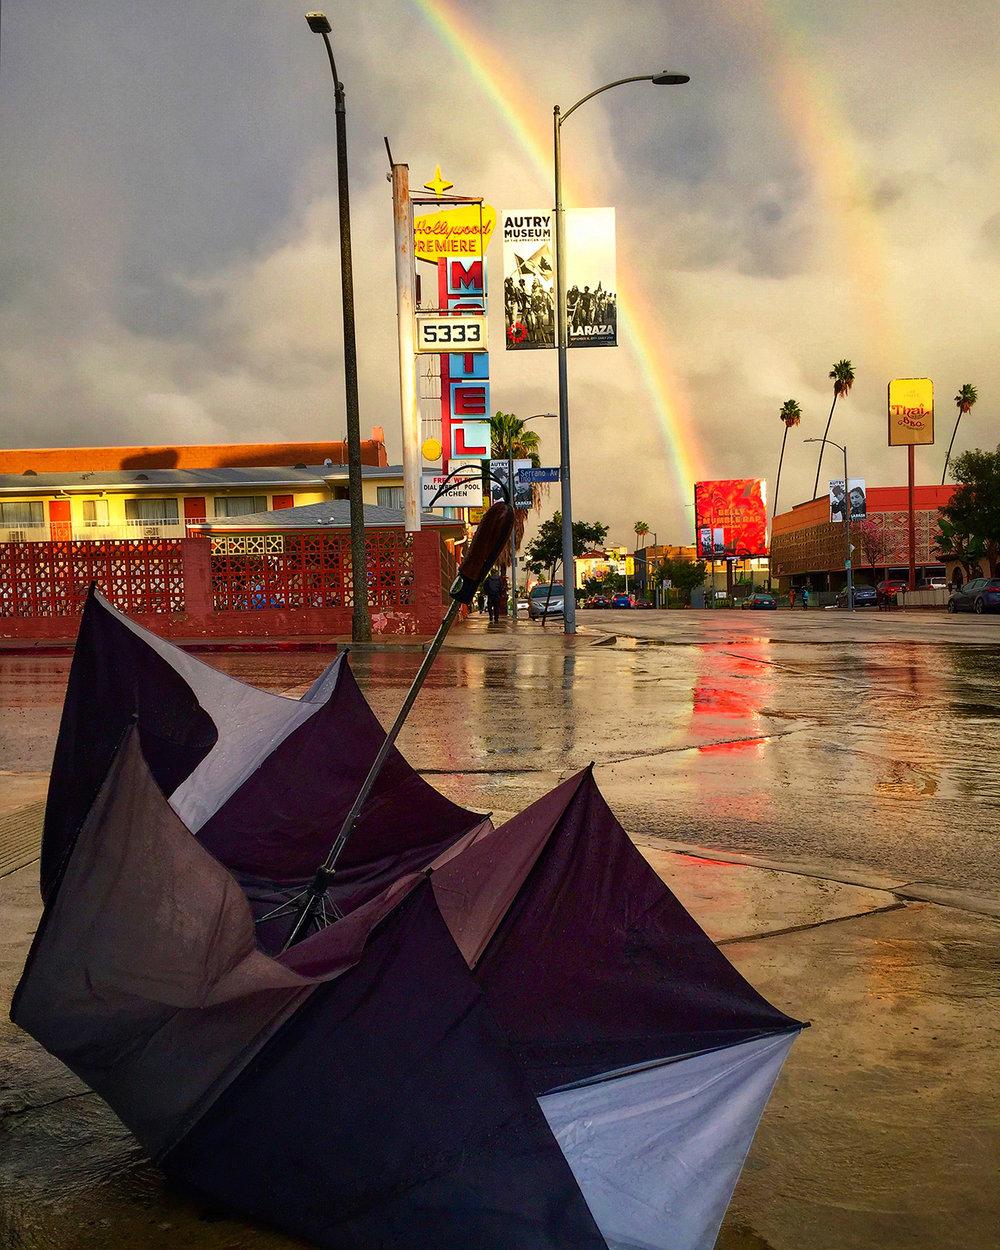 Lay Down Your Umbrellas